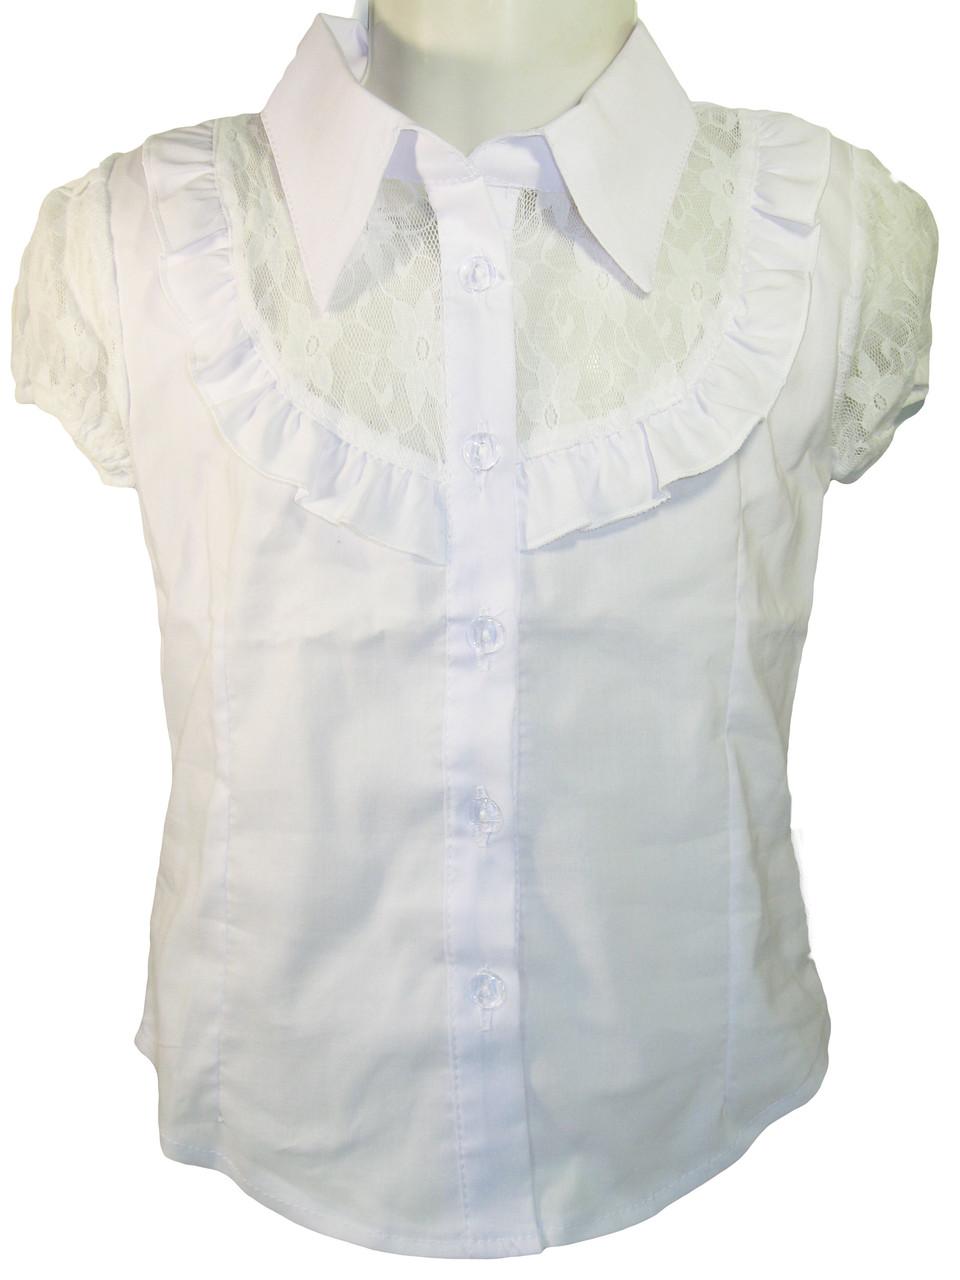 Блузка нарядная белая для девочек, размеры 98-158, арт. 110